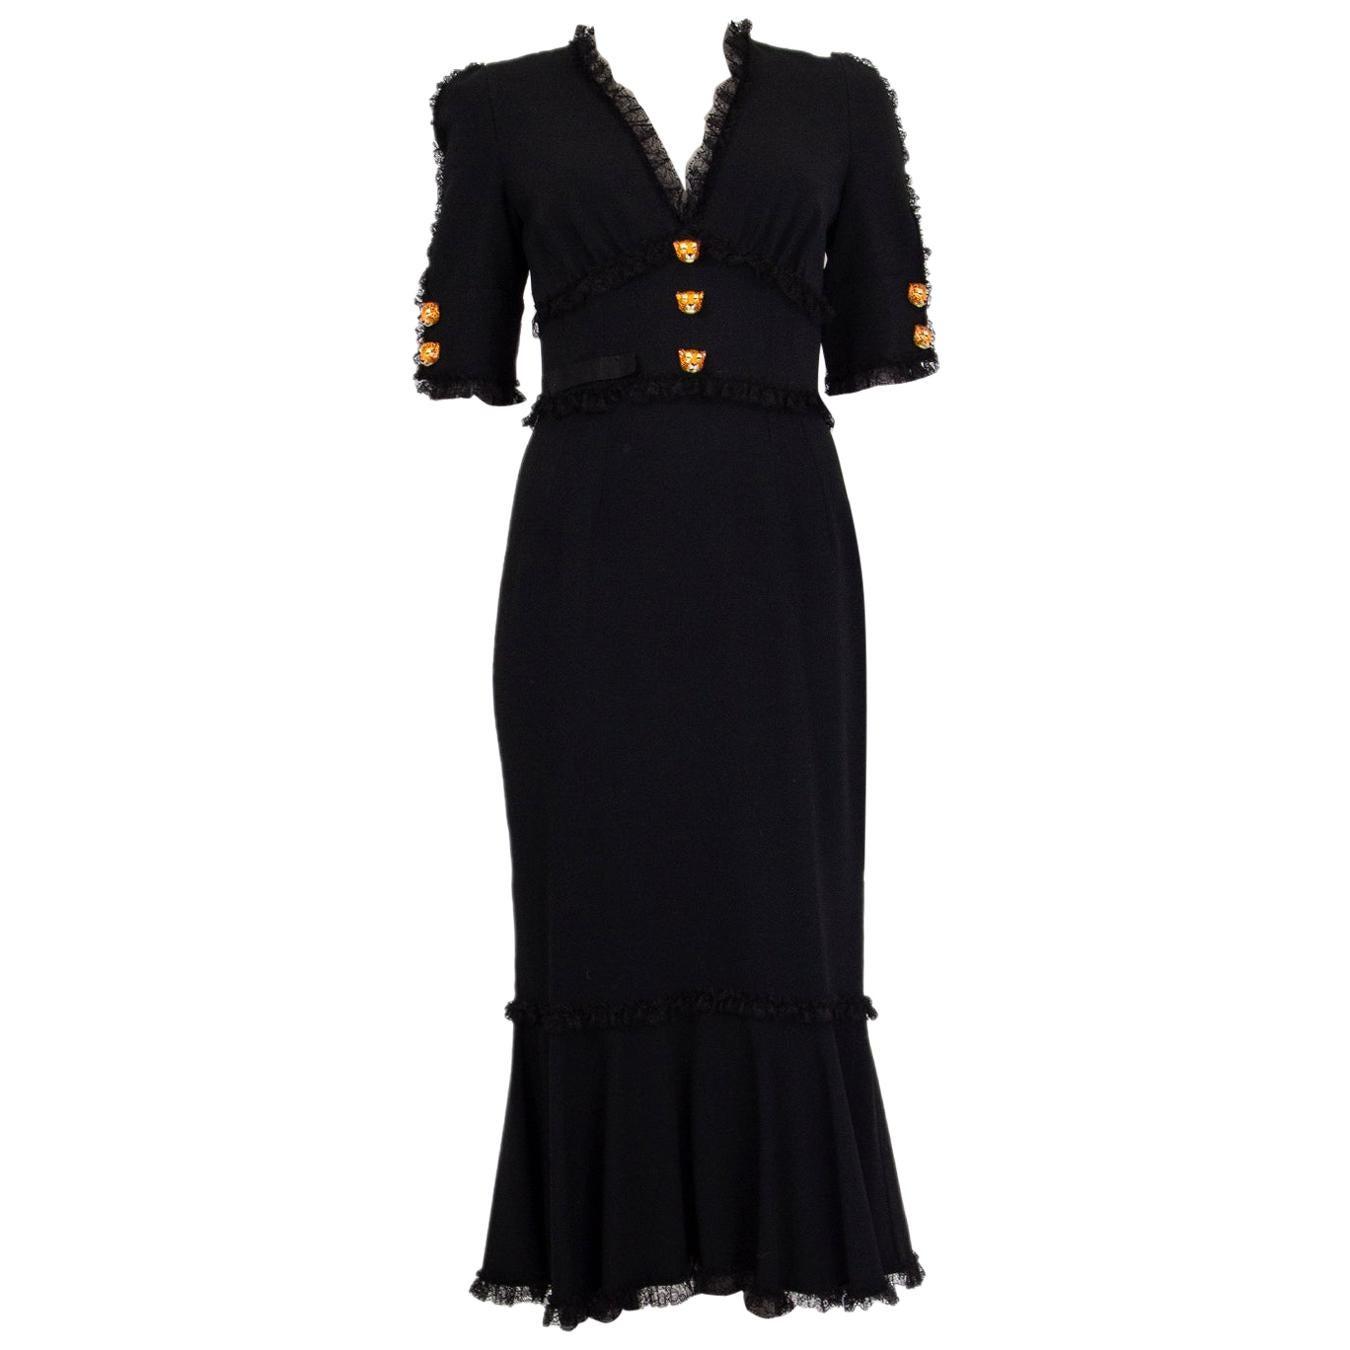 DOLCE & GABBANA black LACE TRIMMED MERMAID Dress S